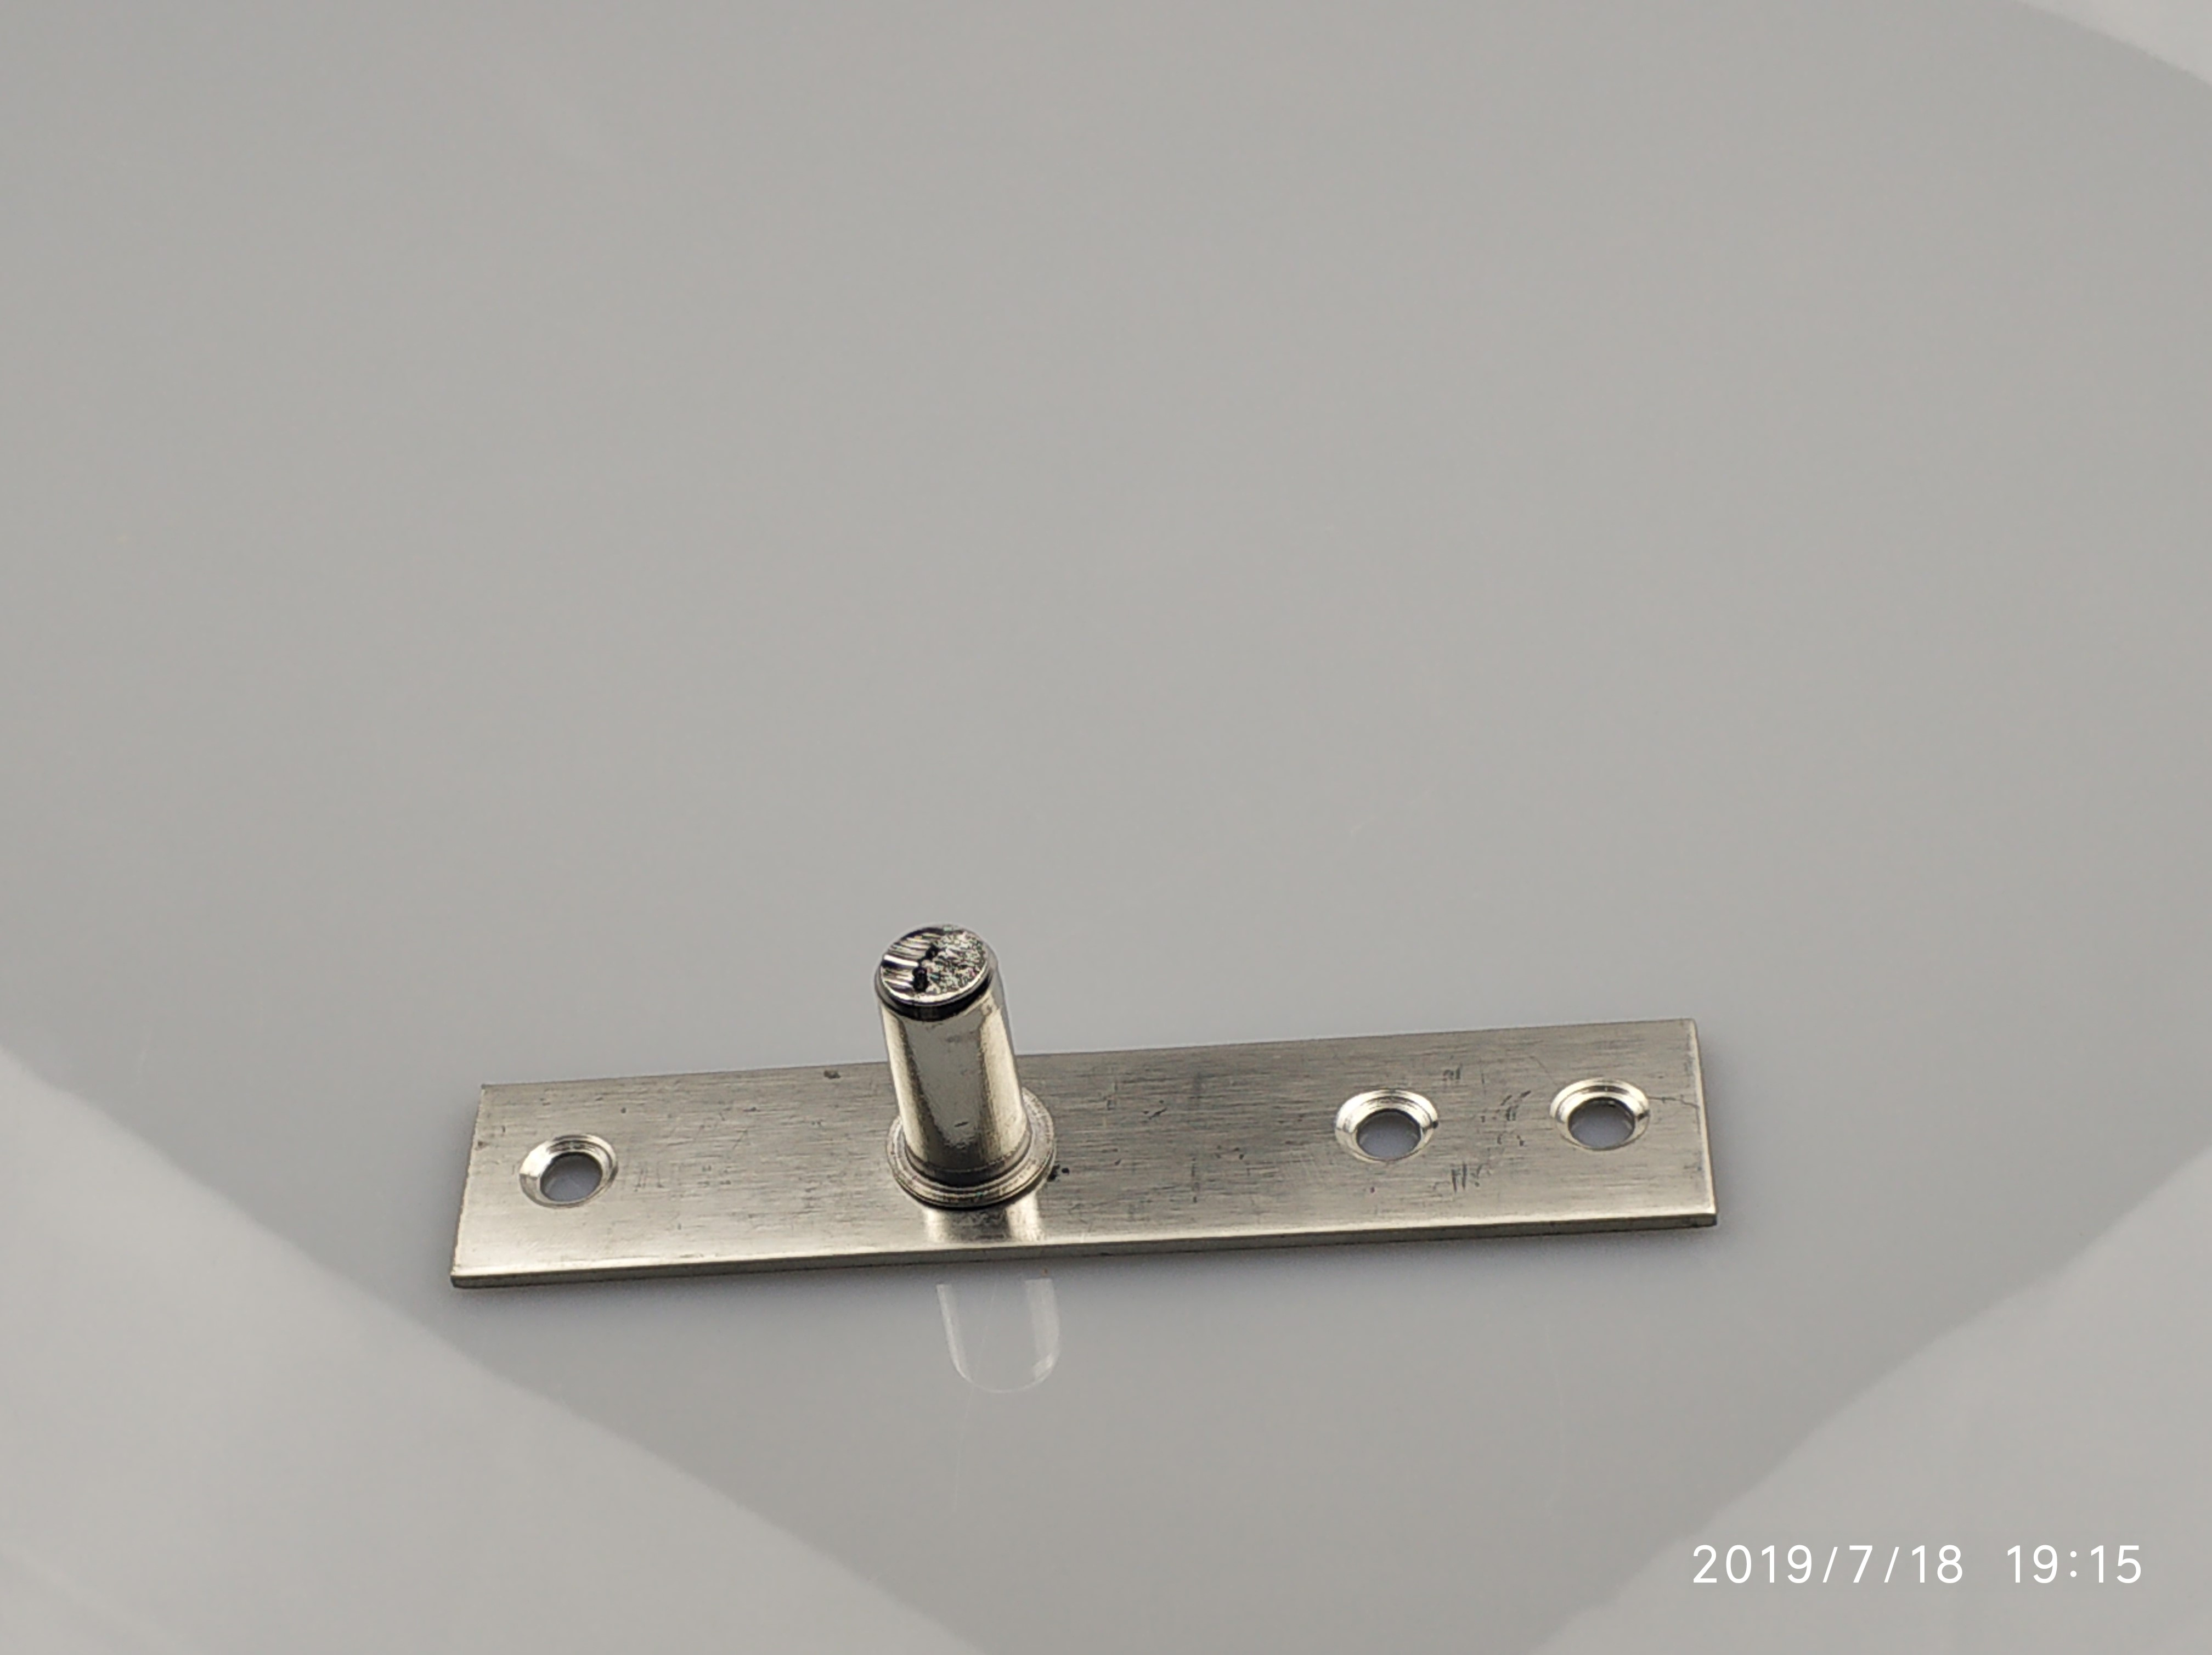 D-006 多码款直孔顶轴 D-006 多码款直孔顶轴价格 多码款直孔顶轴生产厂家